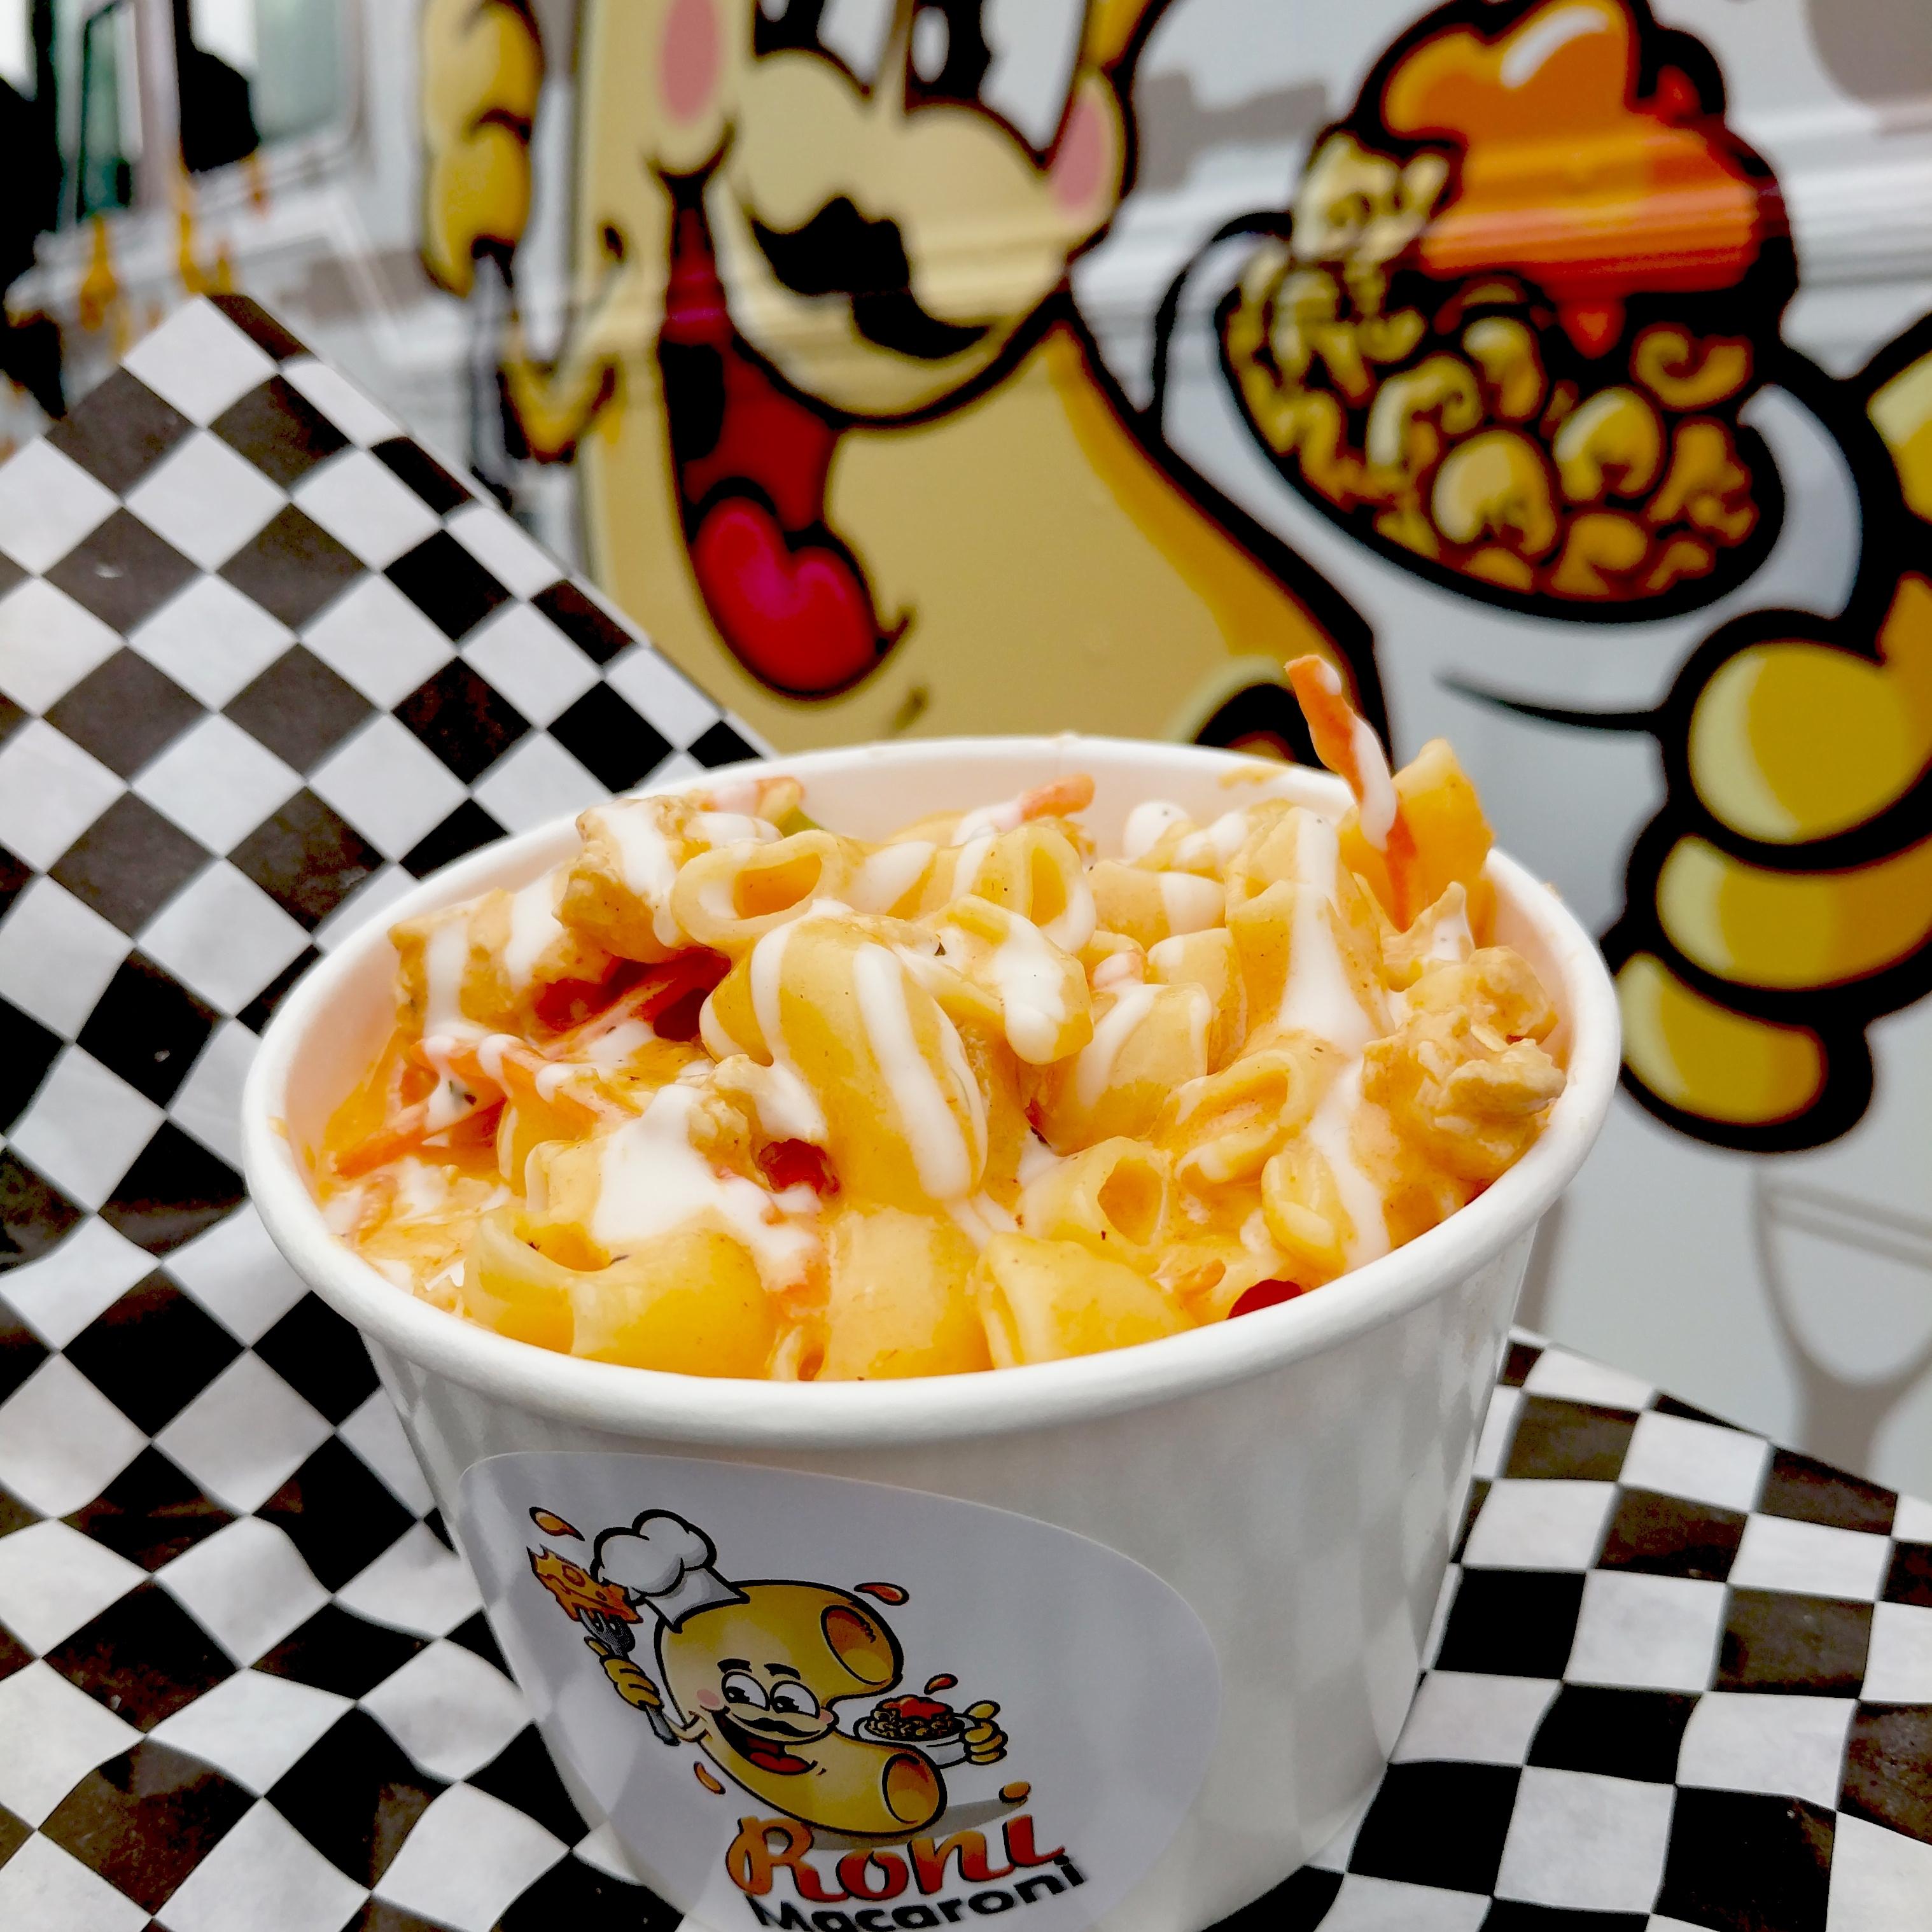 Roni Macaroni - Buffalo Ranch Chicken Mac & Cheese - Foodzooka